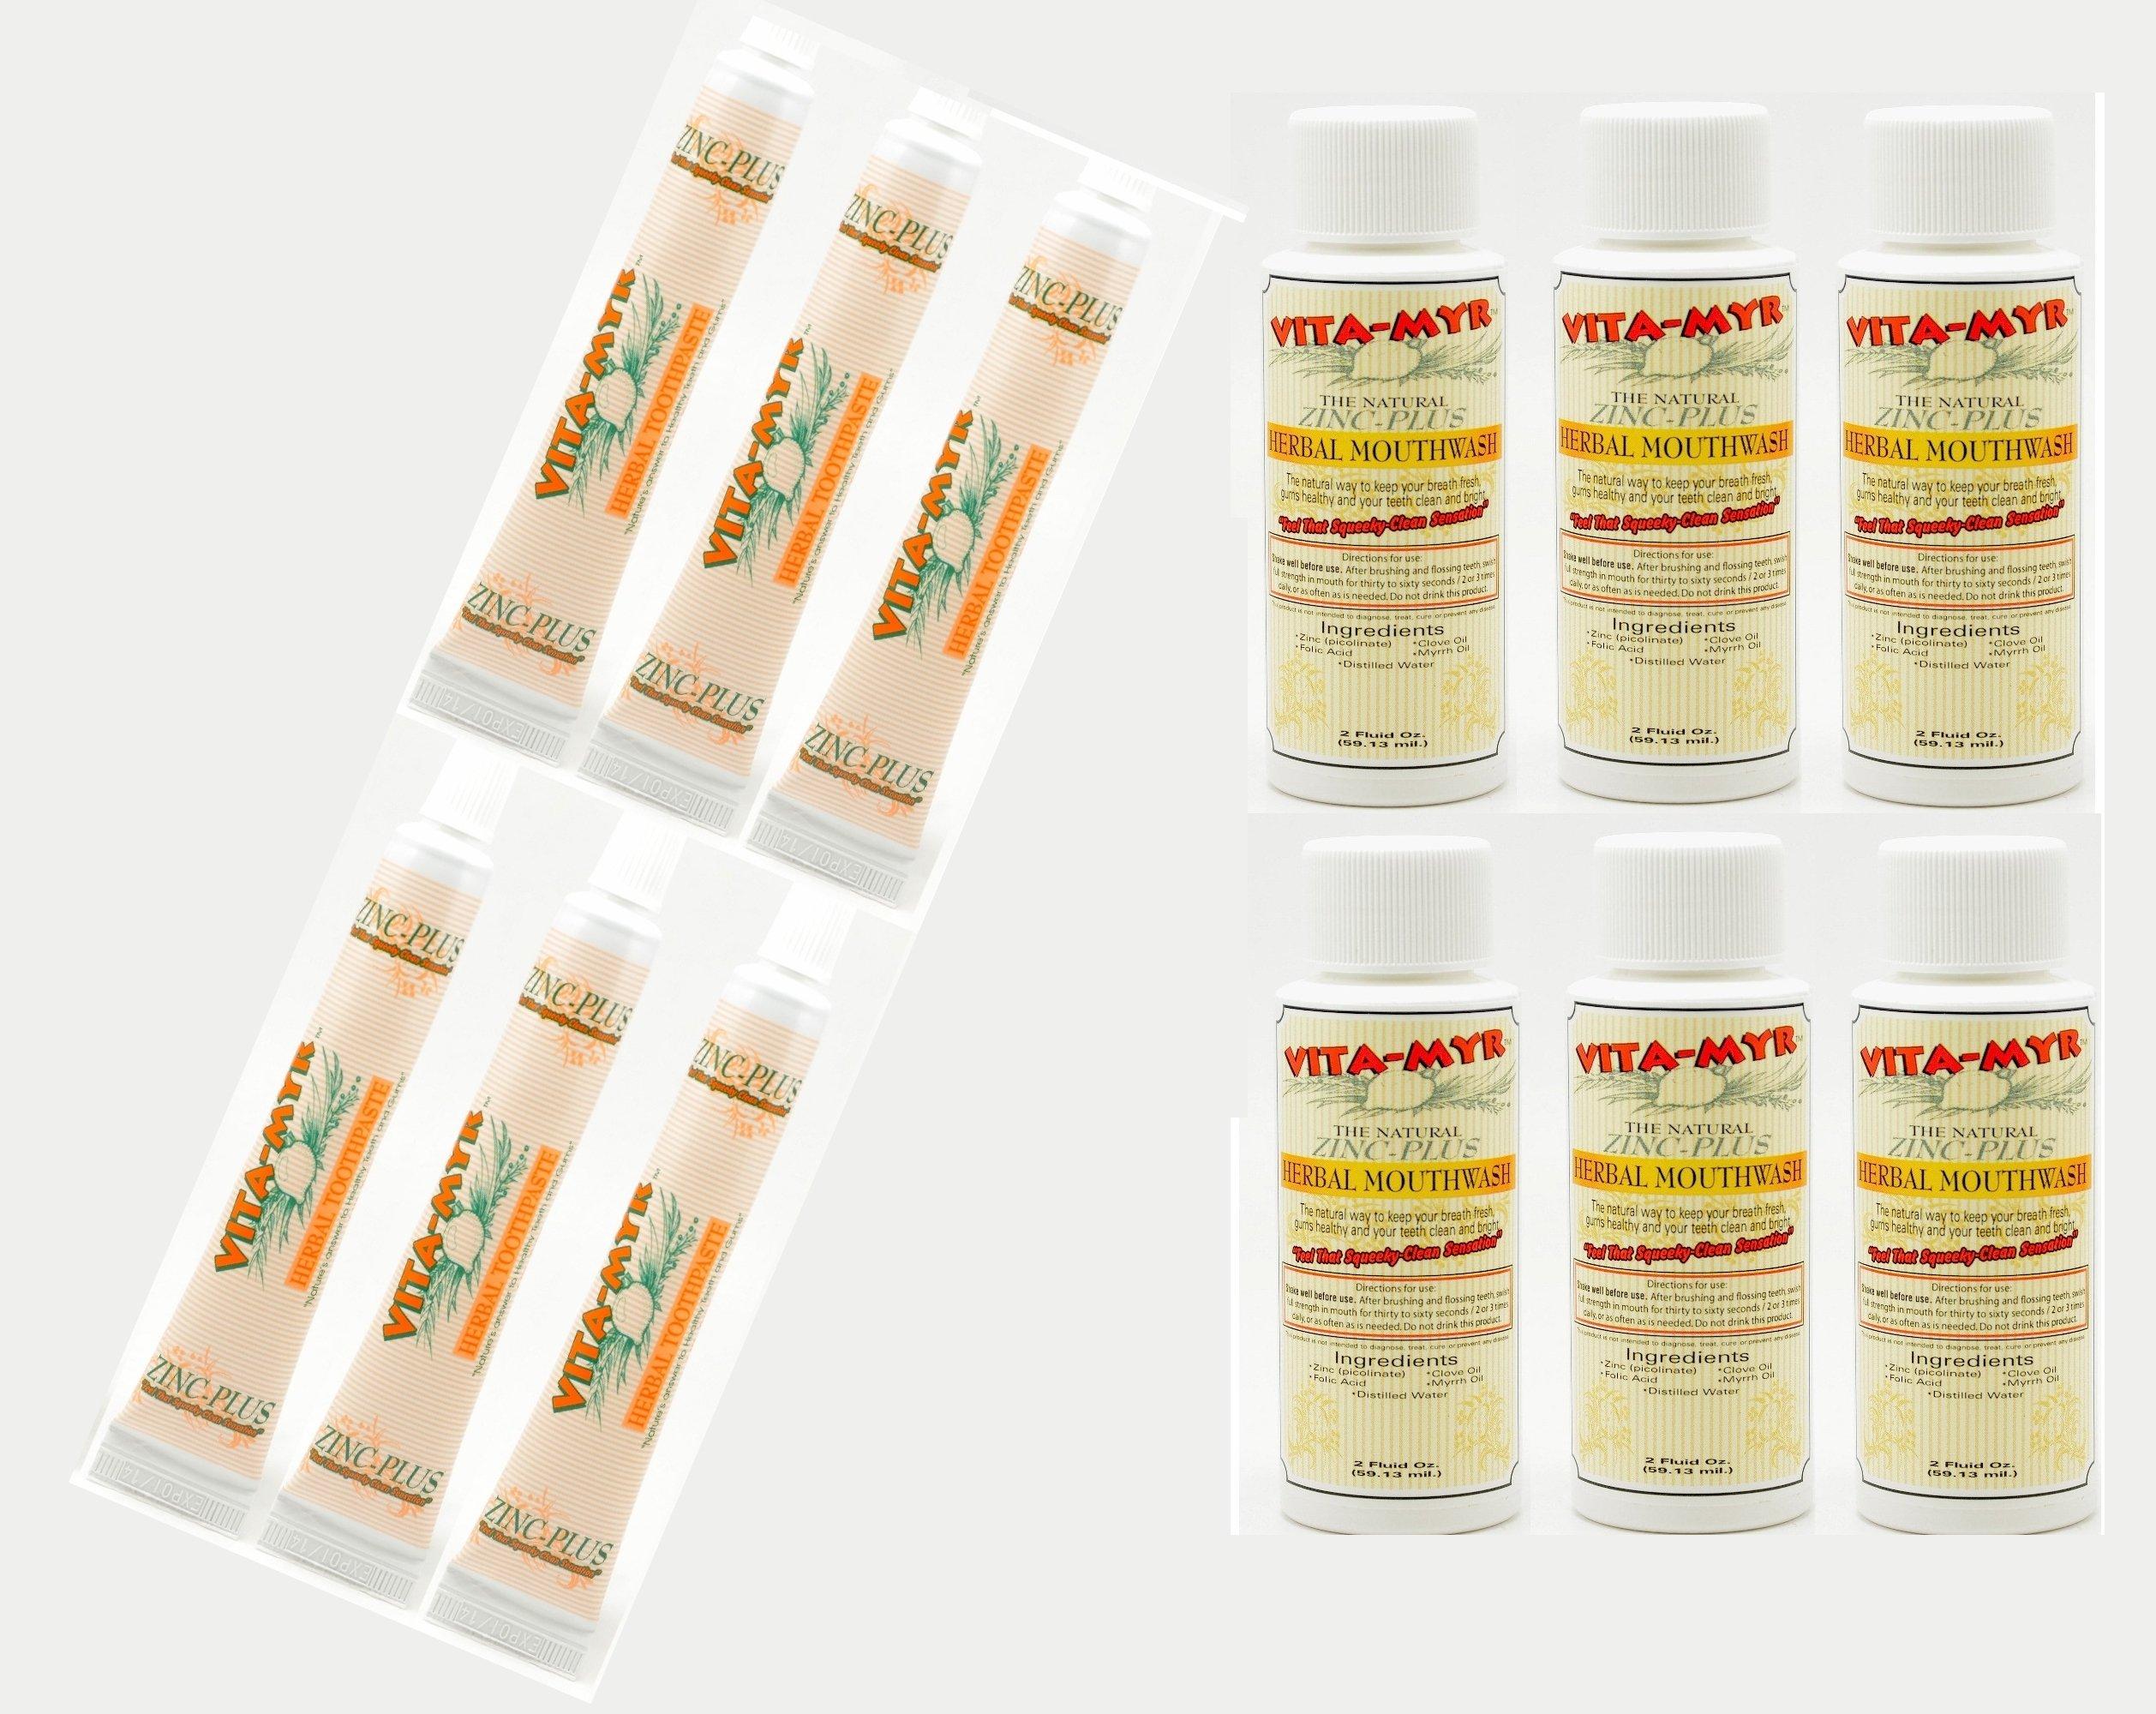 12 Pk VITA-MYR Travel Size Herbal Natural Toothpaste & Natural Mouthwash – Safe & Effective 6ea 2 Oz Mouthwash & 6ea 1 Oz Toothpaste No SLS, No Sugar, No Fluoride Gluten Free & Vegan